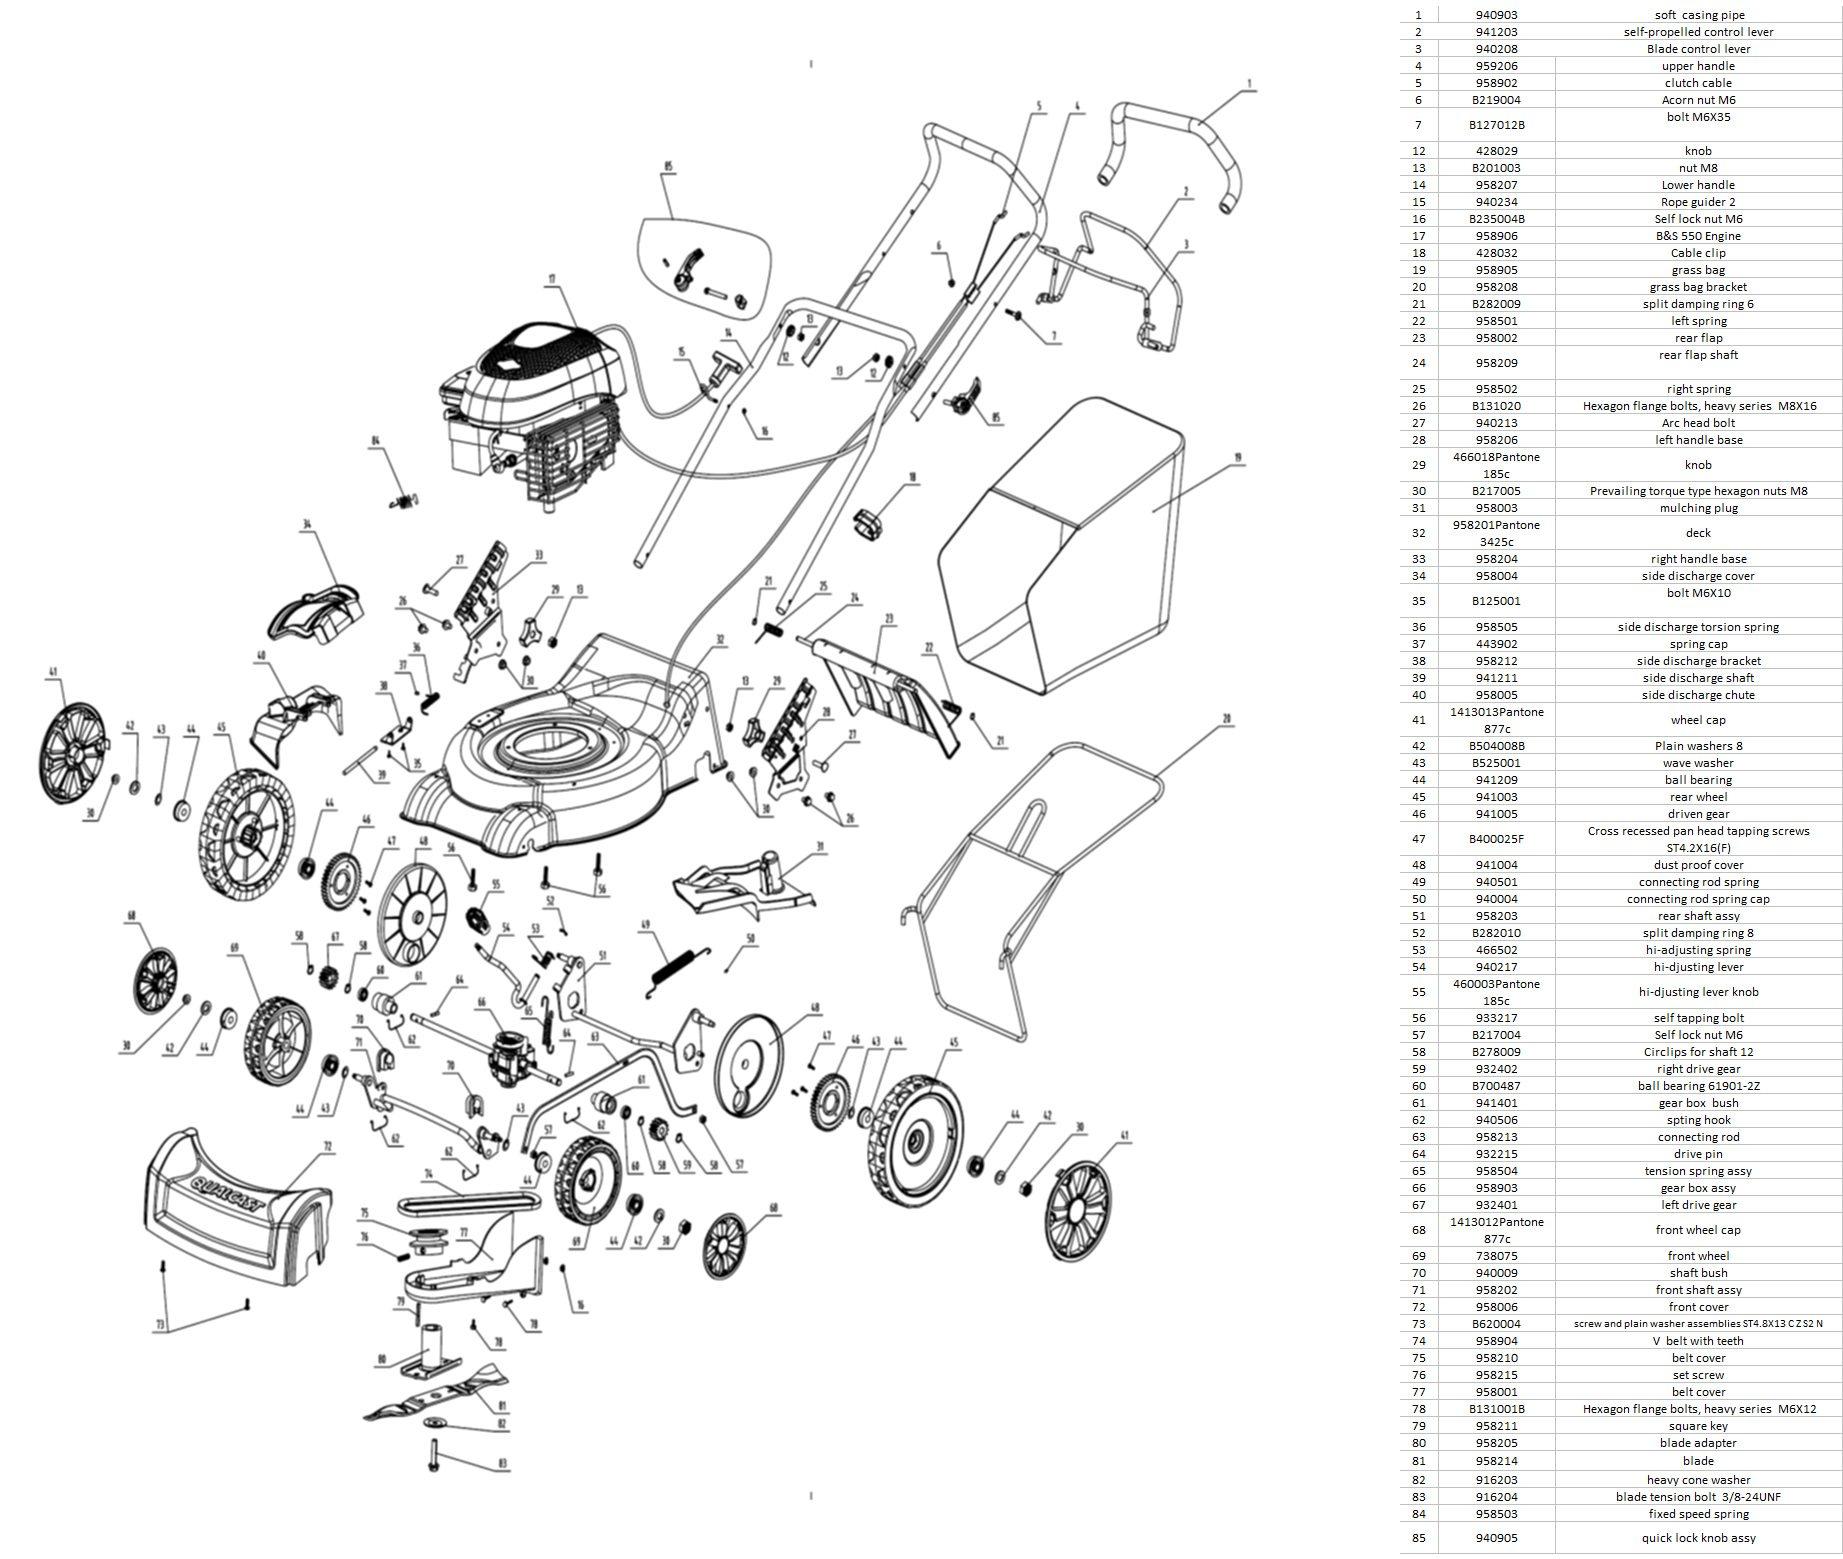 Qualcast 48cm Self Propelled Petrol Lawnmower